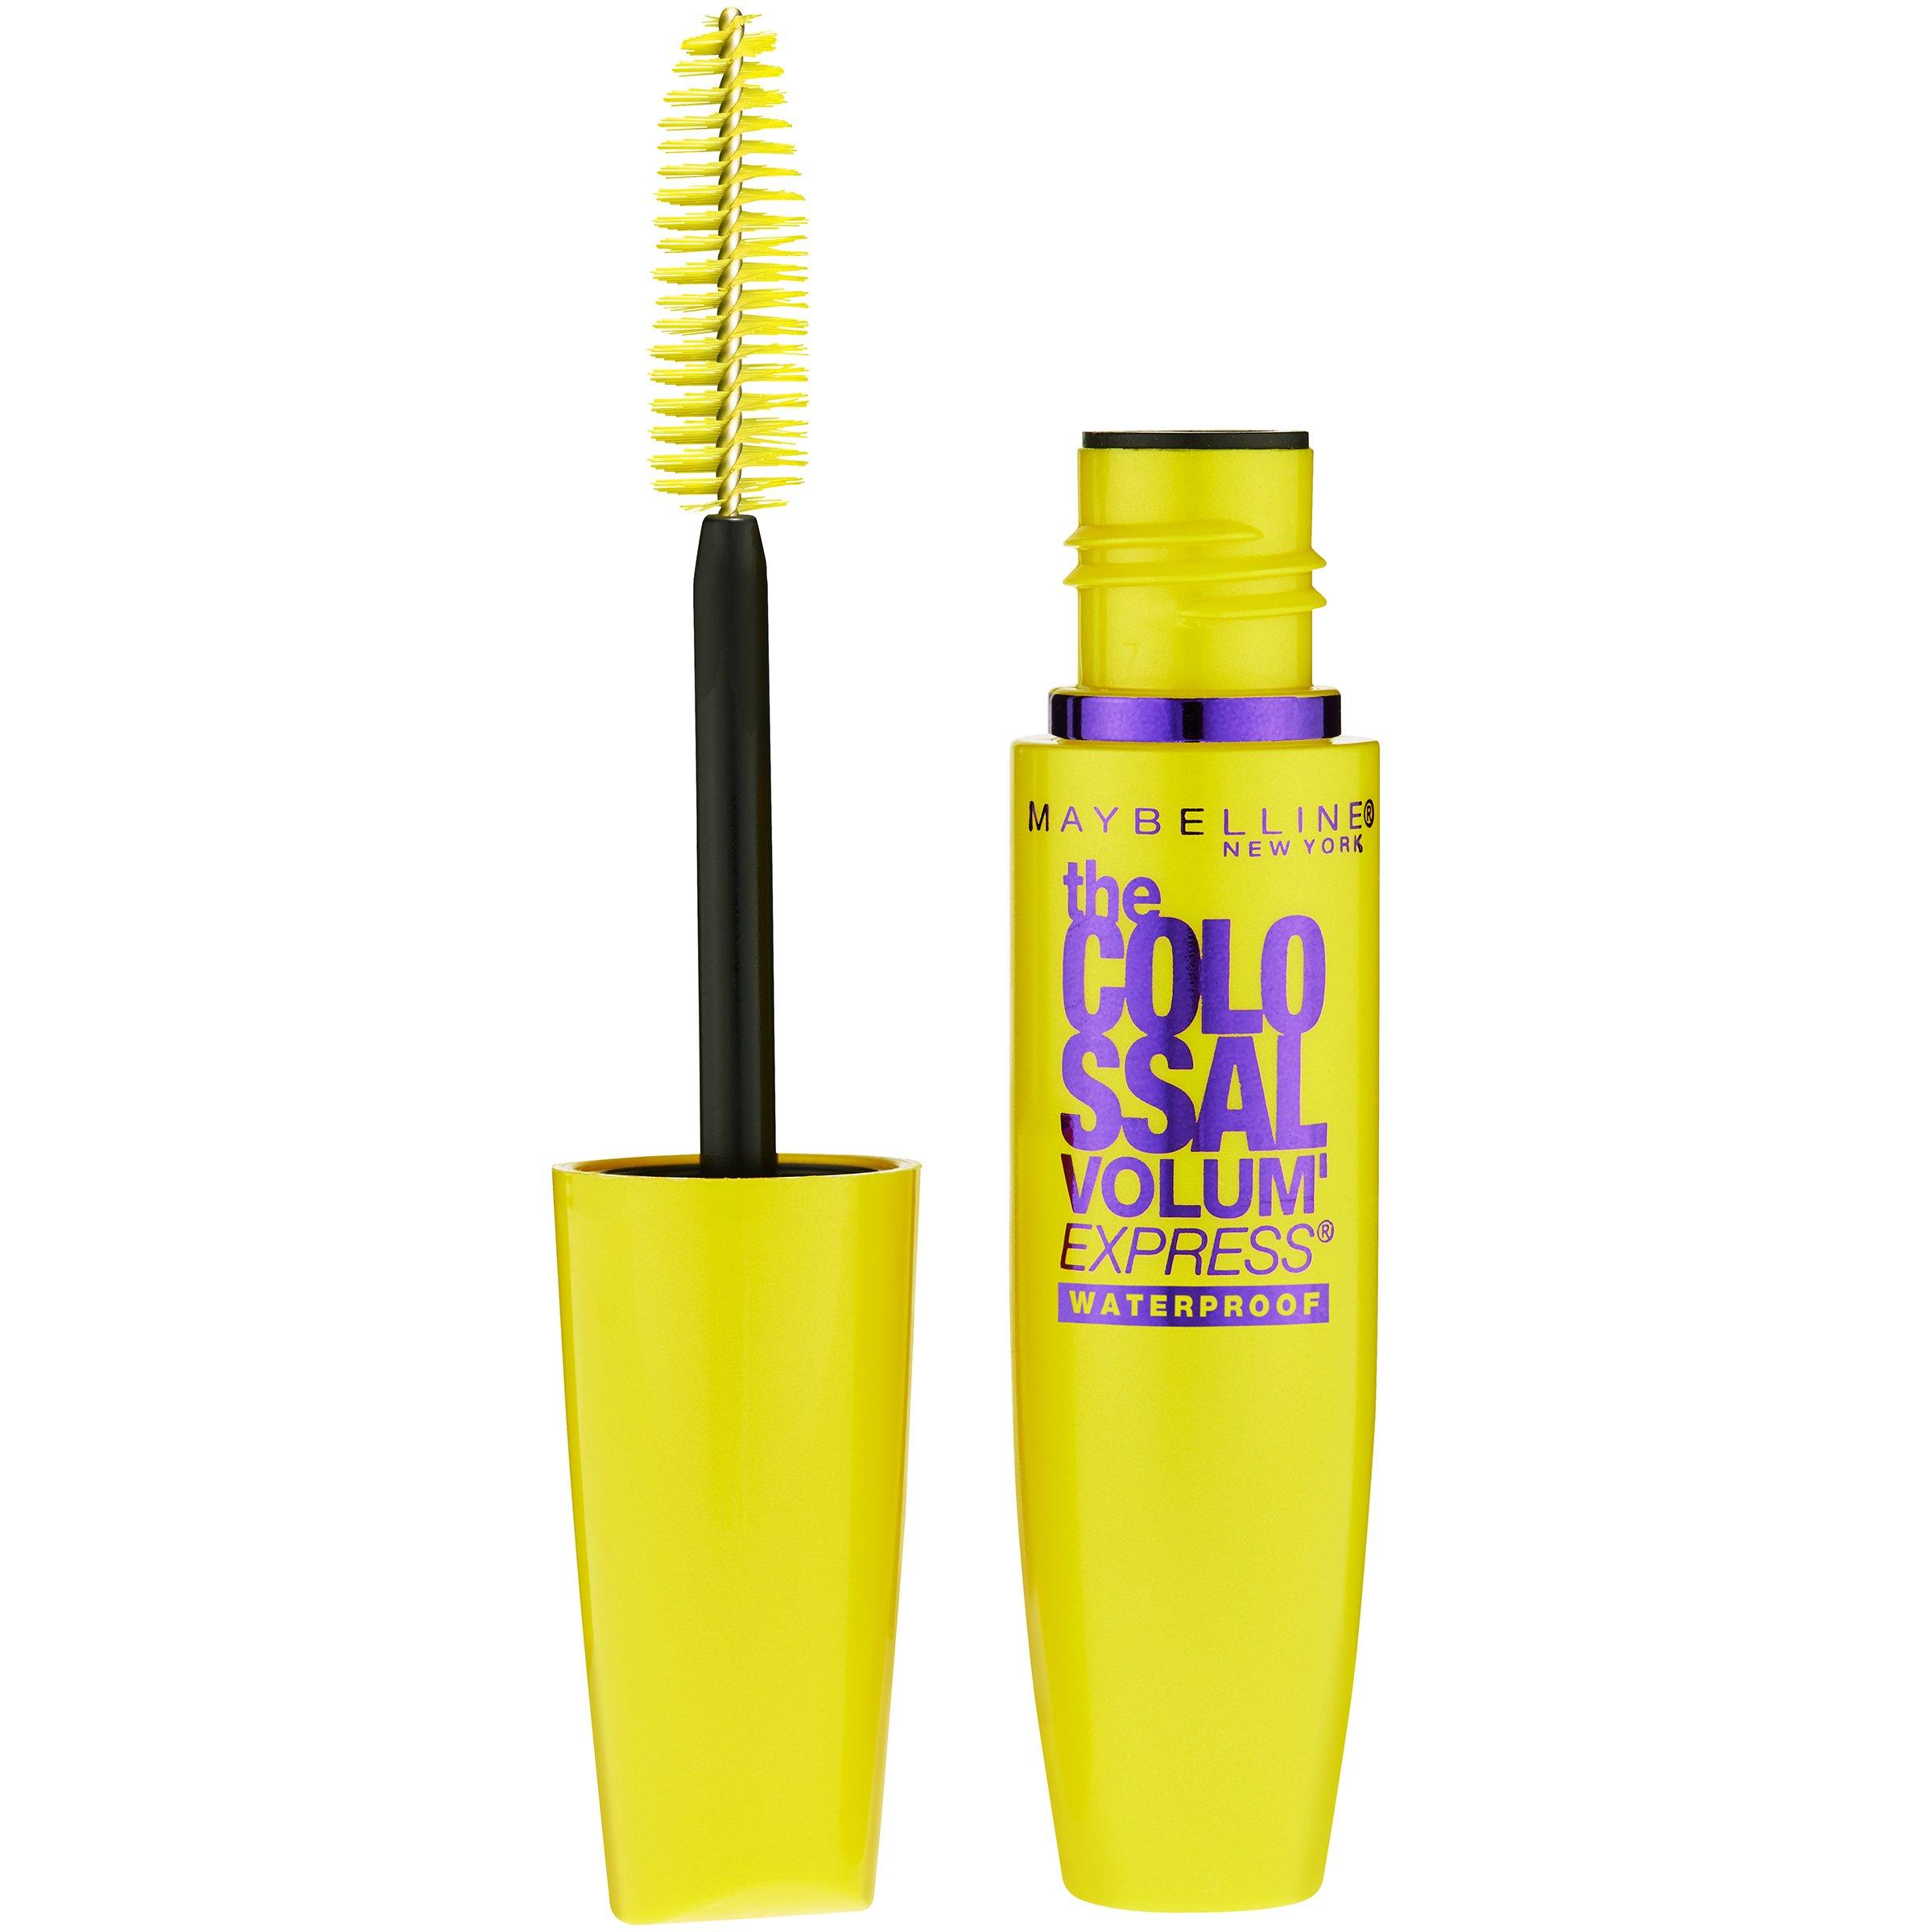 Maybelline Makeup Volum' Express The Colossal Waterproof Mascara, Classic Black Mascara, 0.27 fl oz